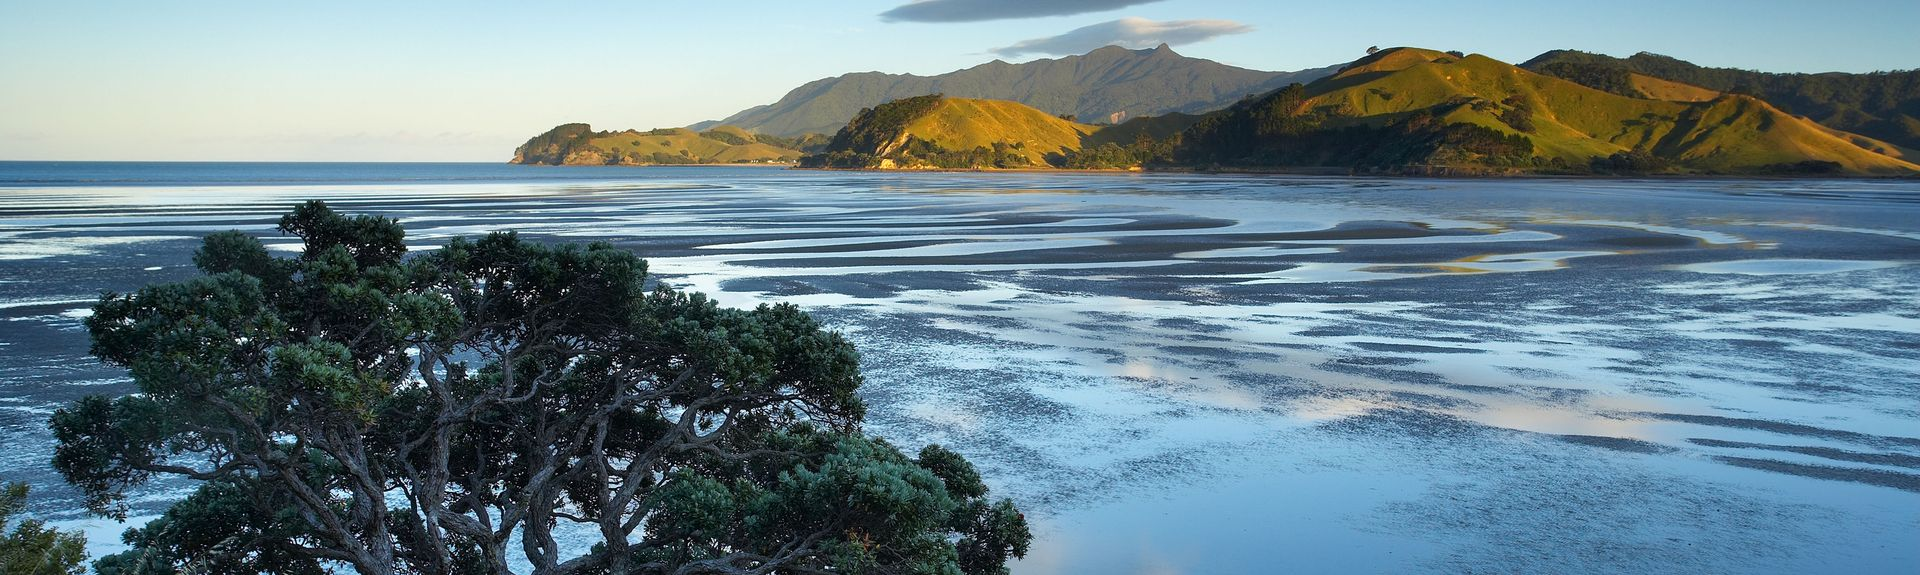 Colville, Waikato, New Zealand